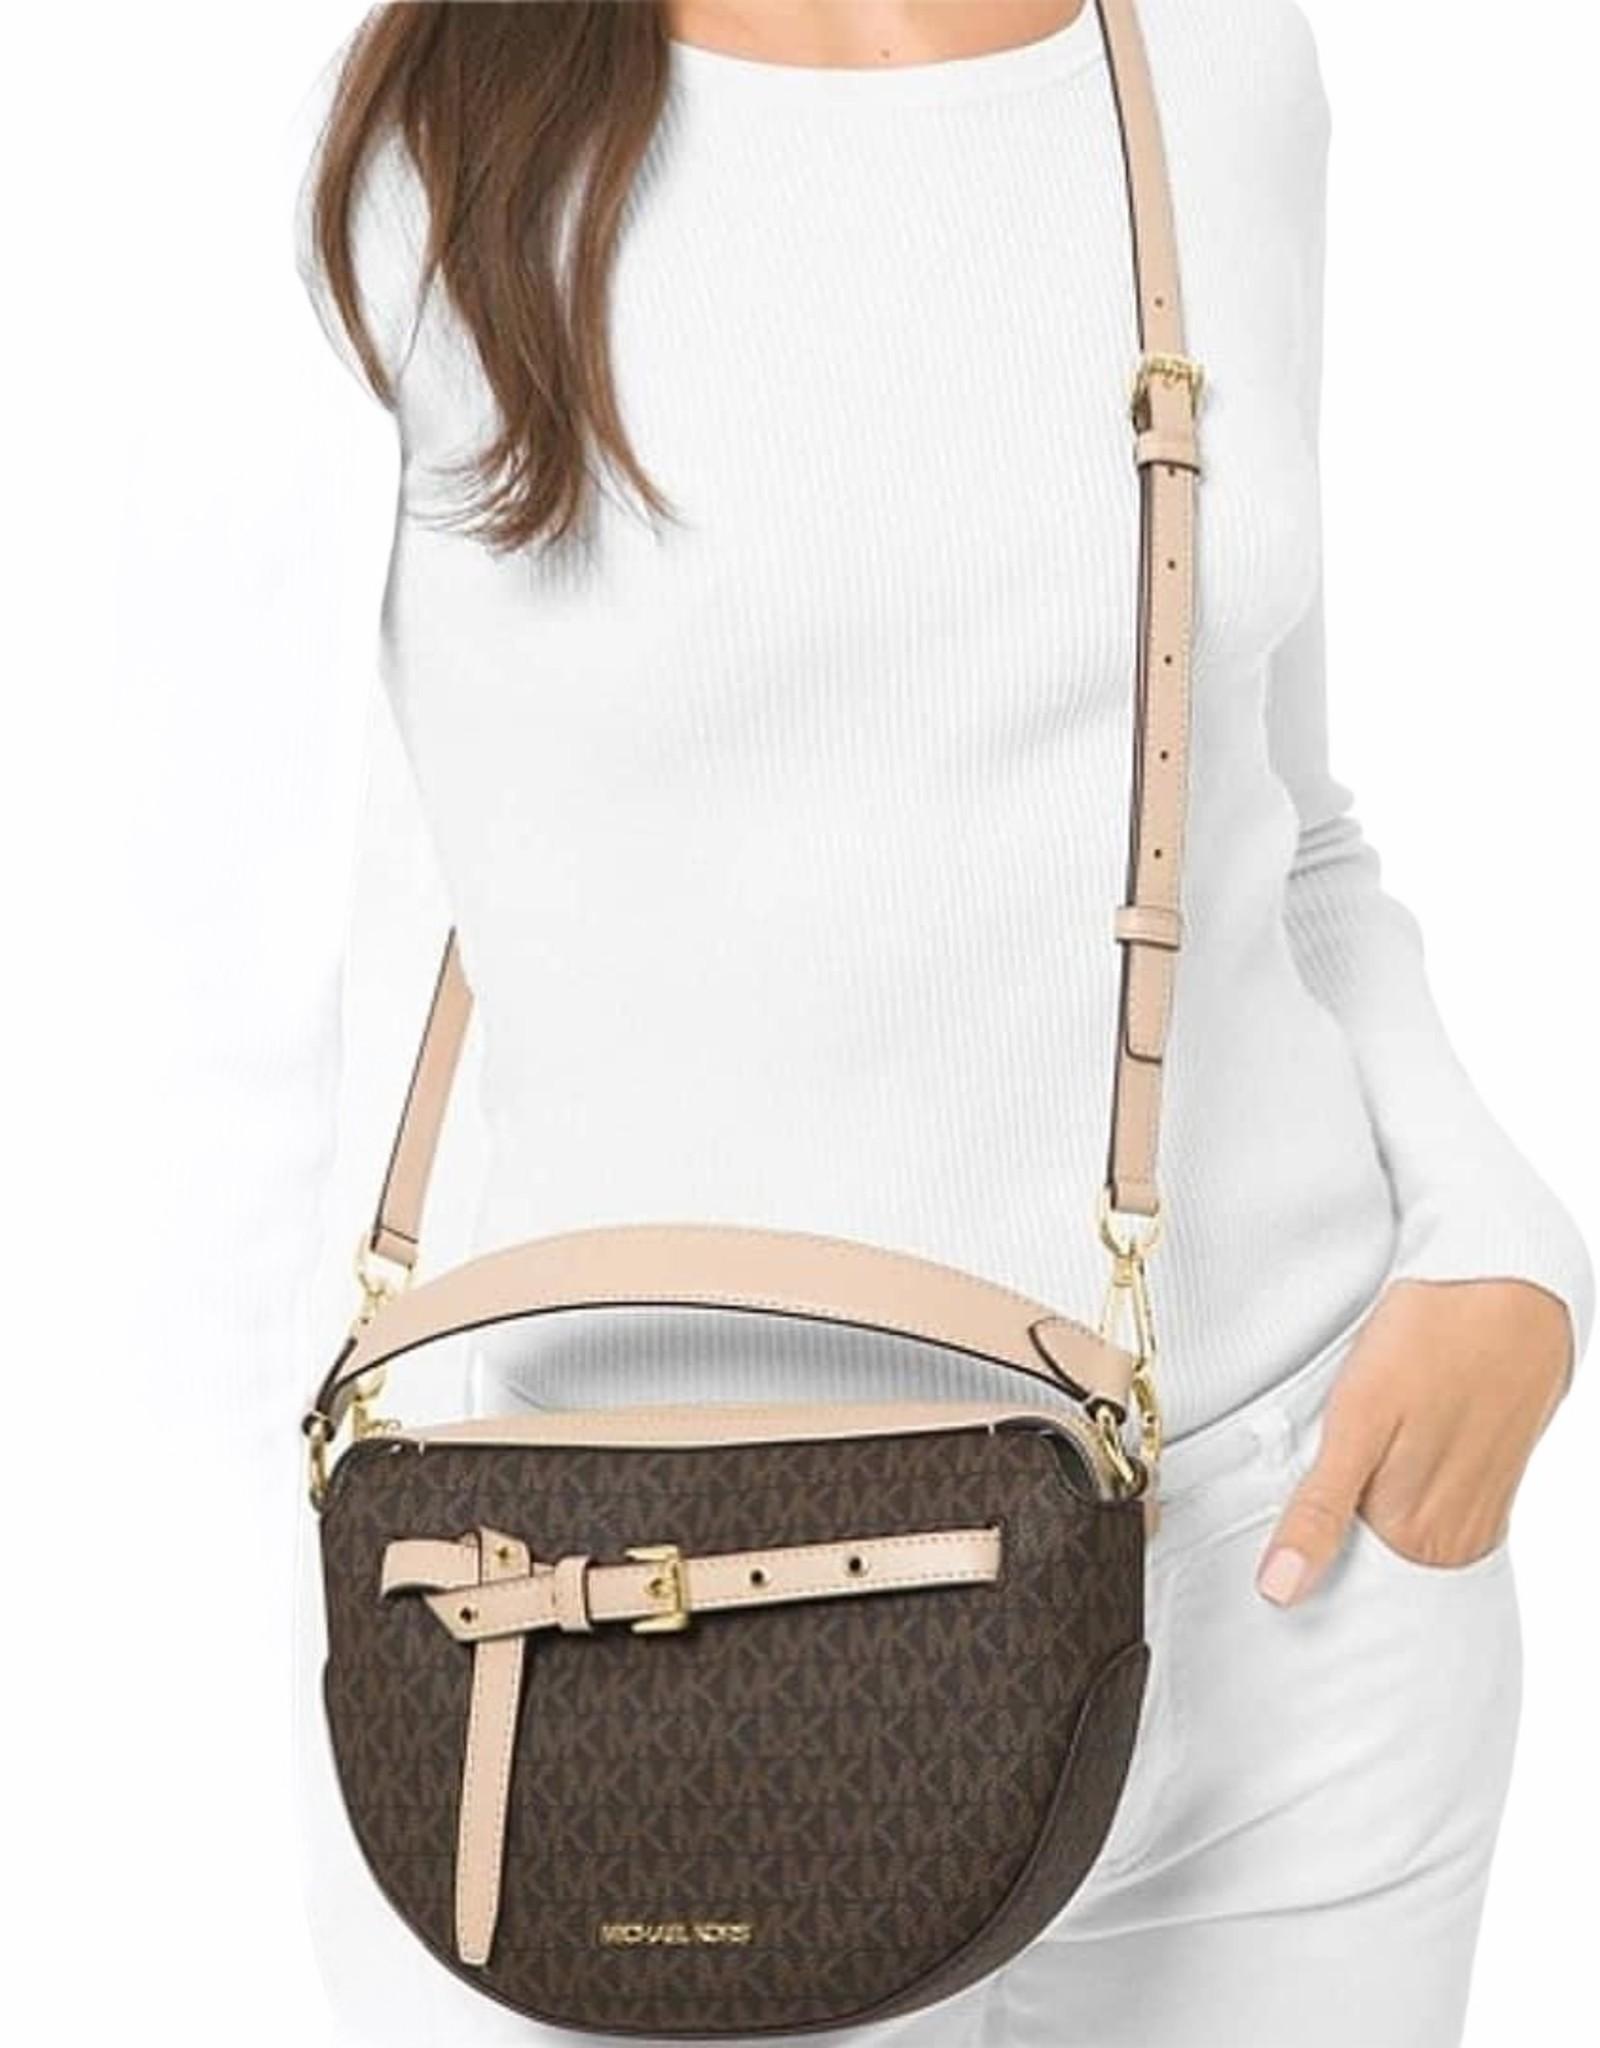 Michael Kors Michael Kors Emilia Medium Logo Halfmoon Crossbody Shoulder Bag